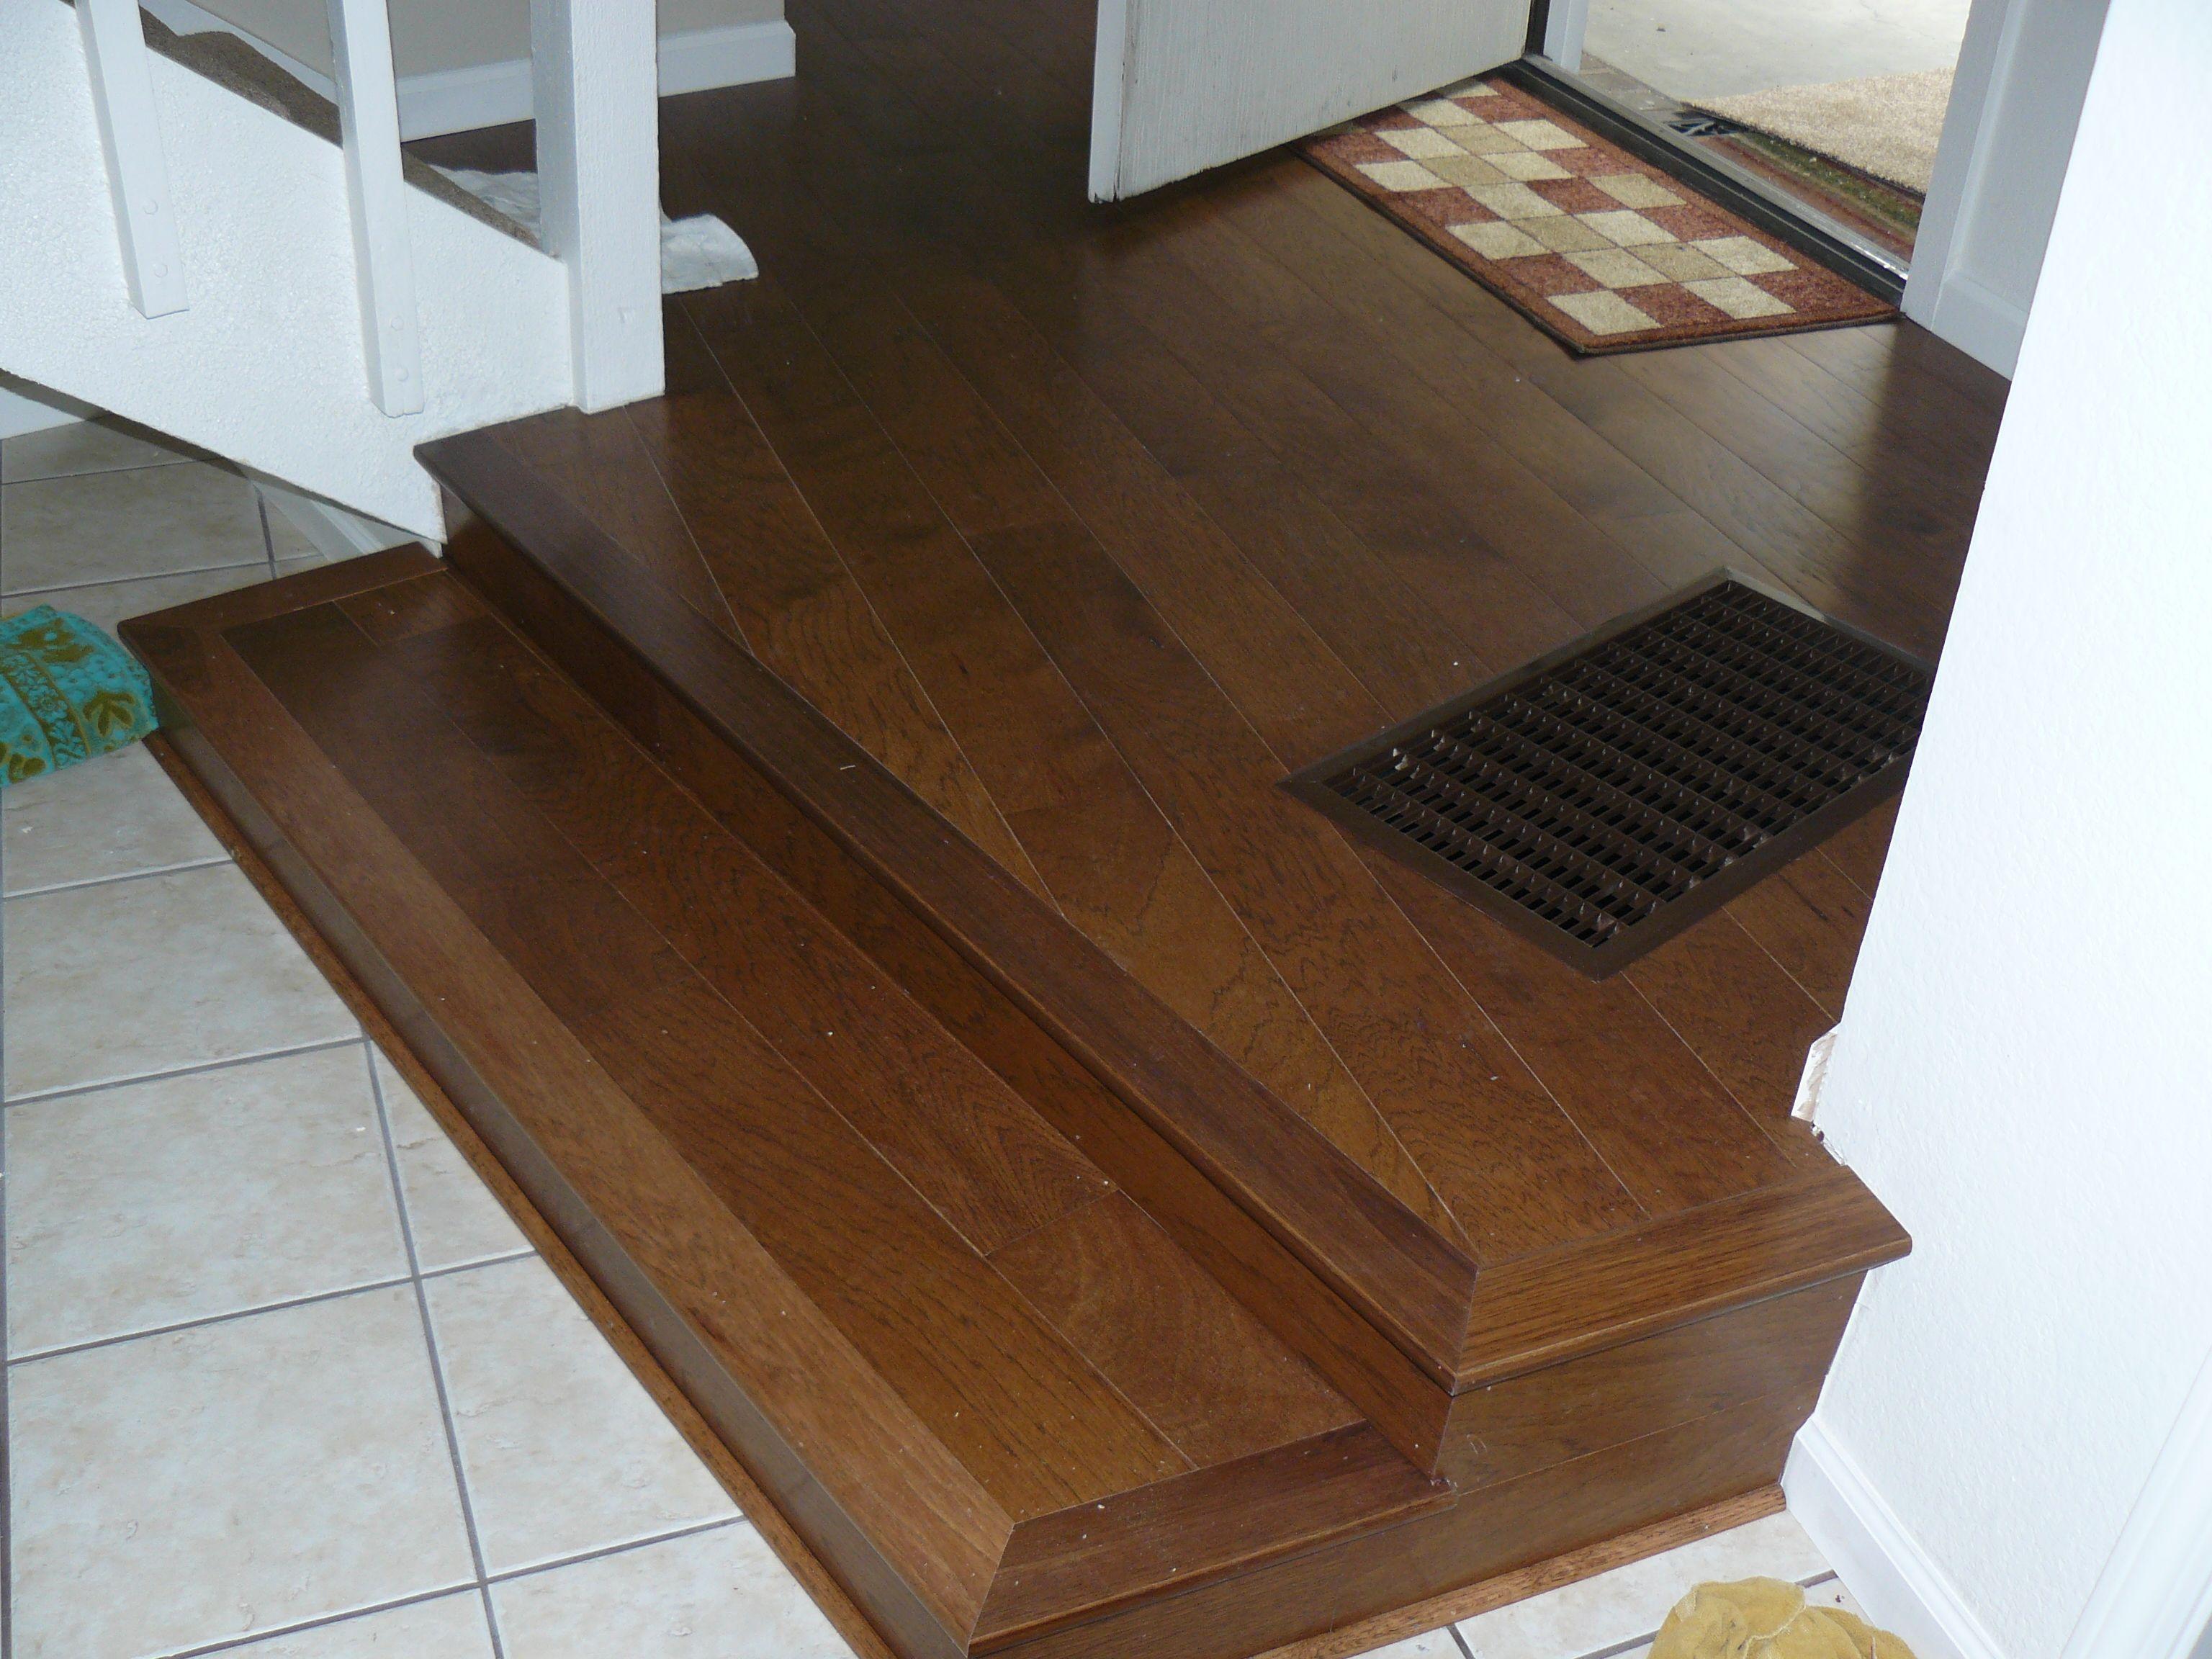 Interior tiles impressive vinyl plank flooring for luxurious interior tiles impressive vinyl plank flooring for luxurious residential design stunning brown teak patterns dailygadgetfo Image collections